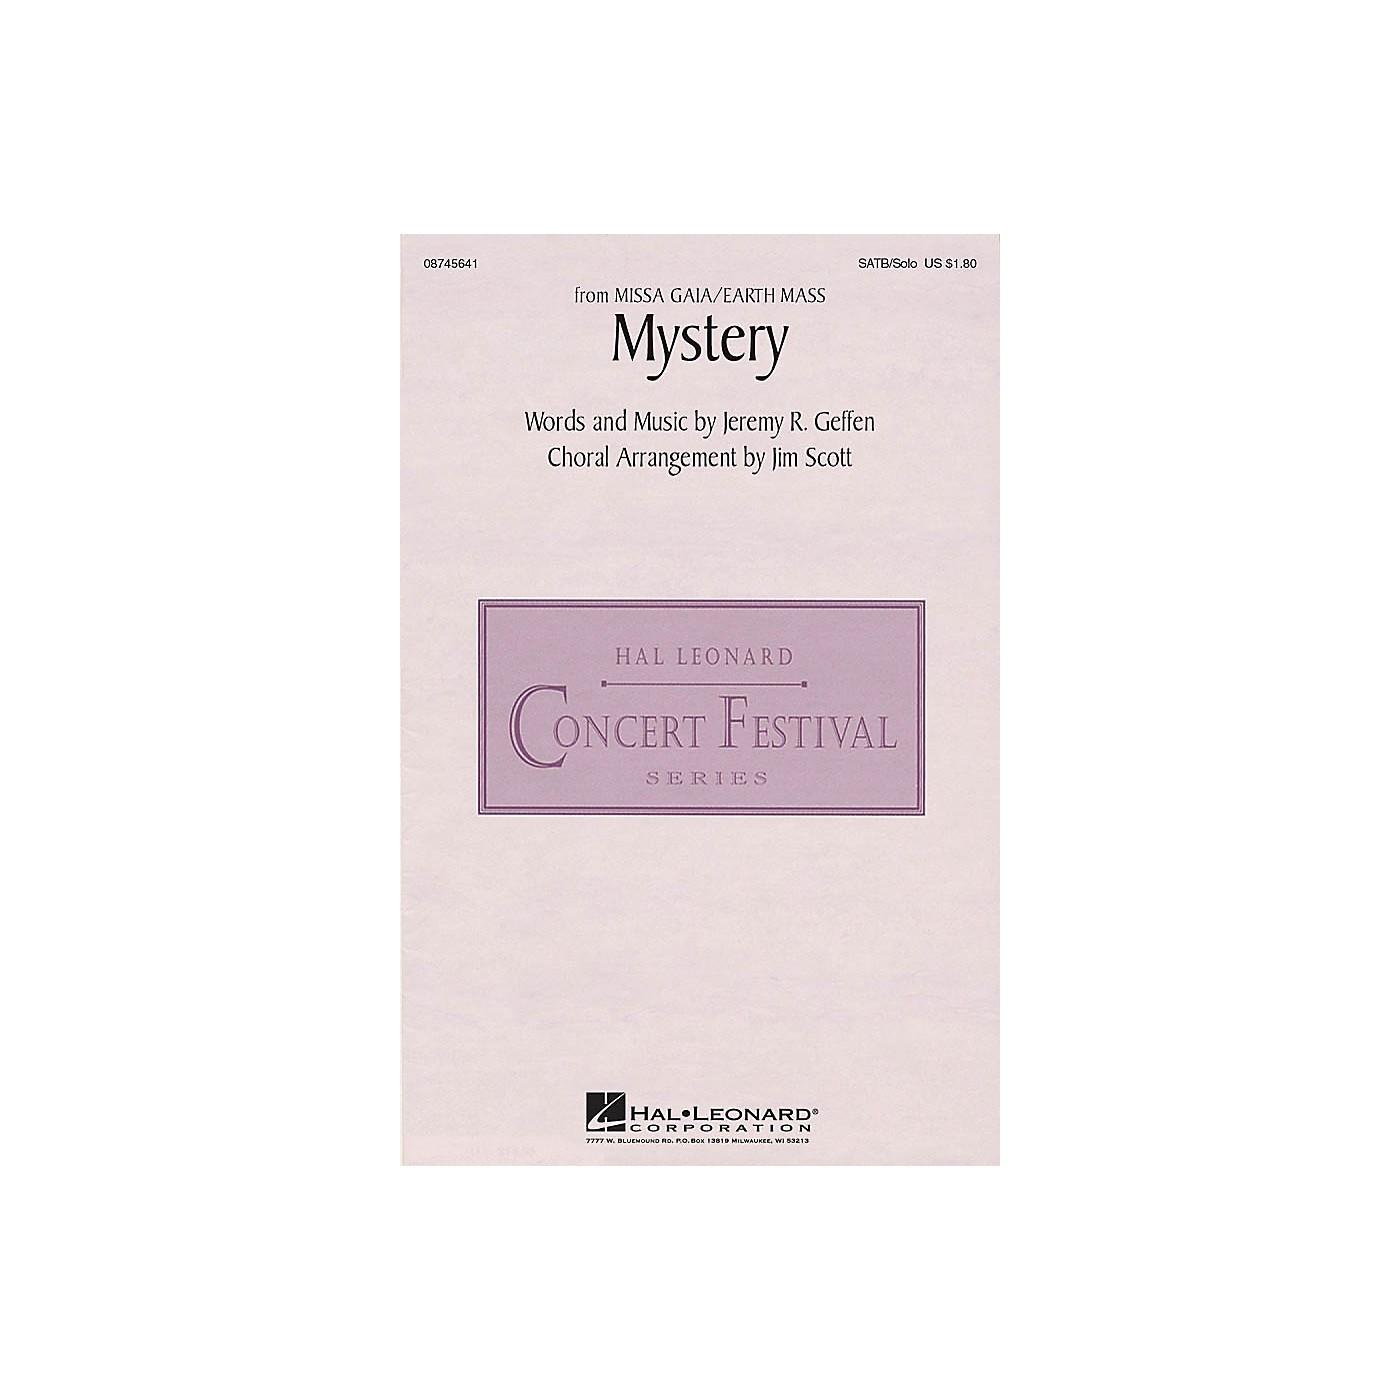 Hal Leonard Mystery (from Missa Gaia/Earth Mass) SATB Chorus and Solo arranged by Jim Scott thumbnail